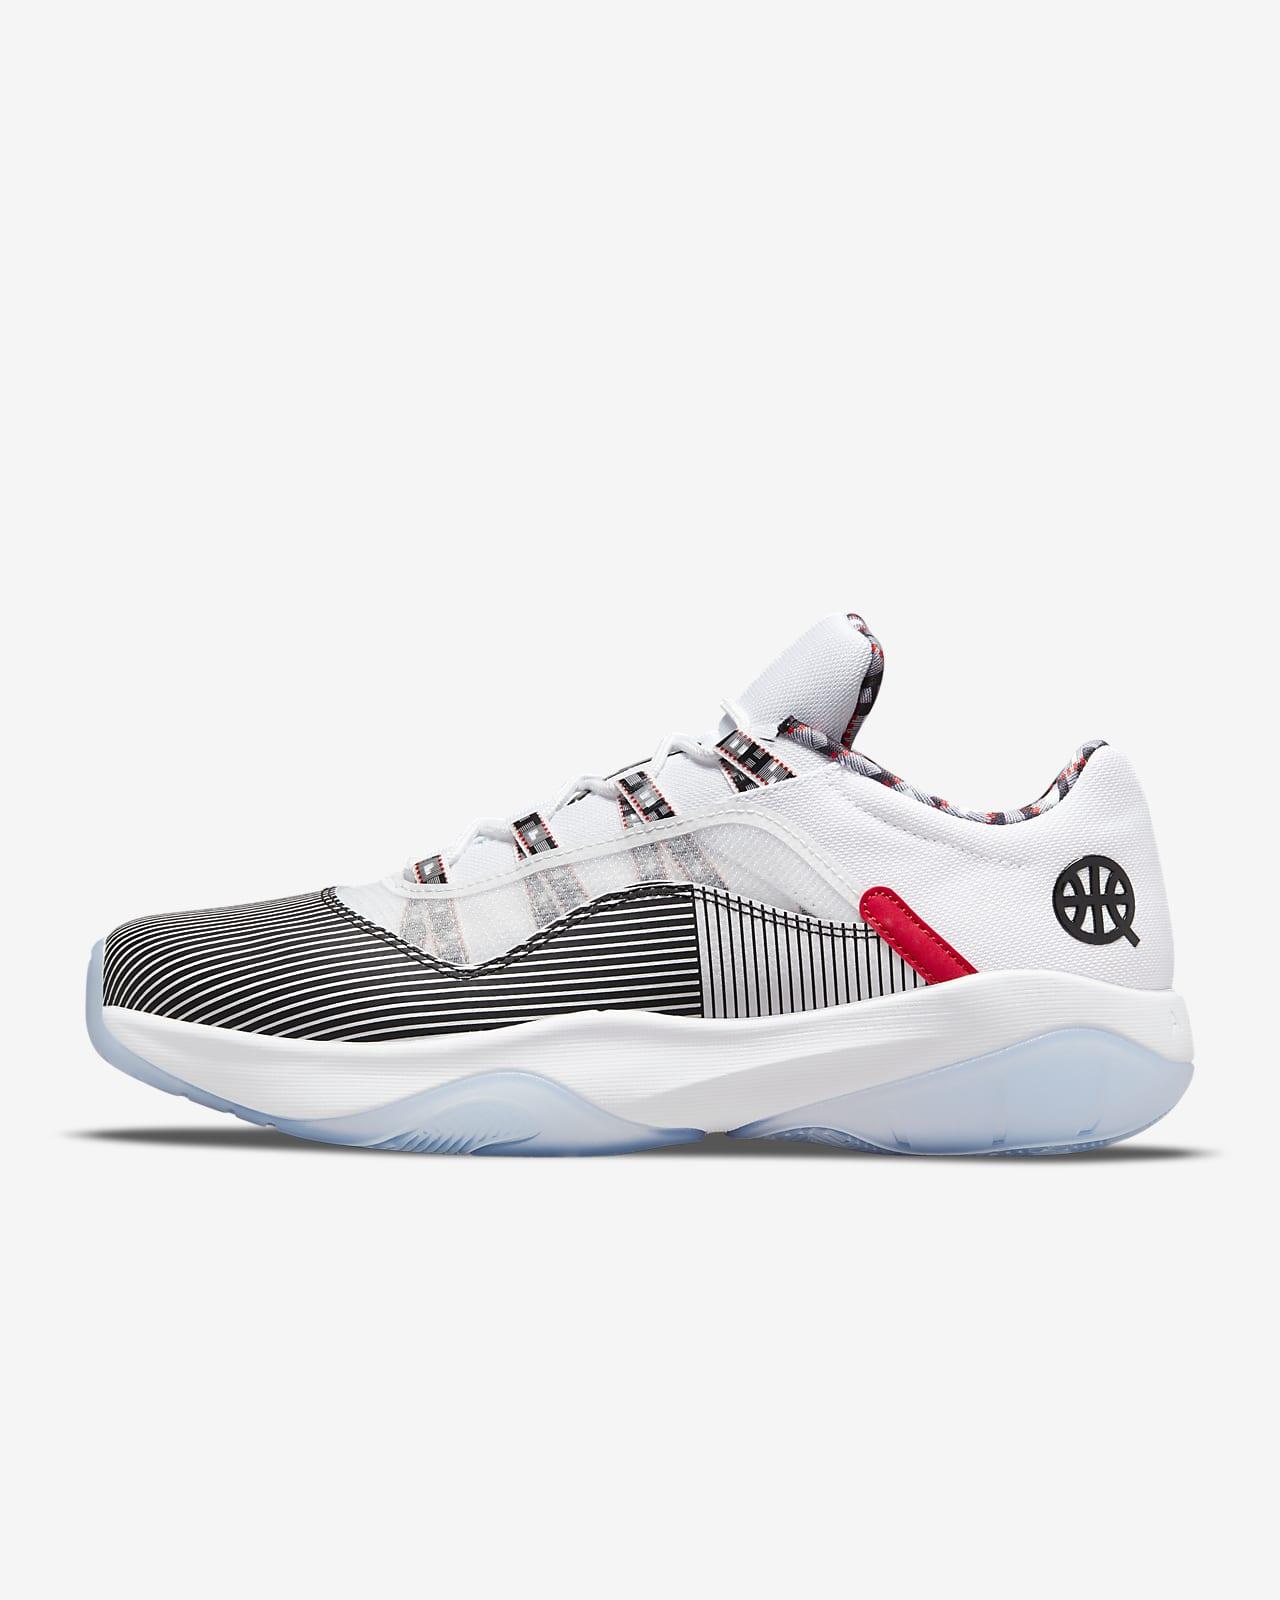 Chaussure Air Jordan 11 CMFT Low Quai 54 pour Homme. Nike LU